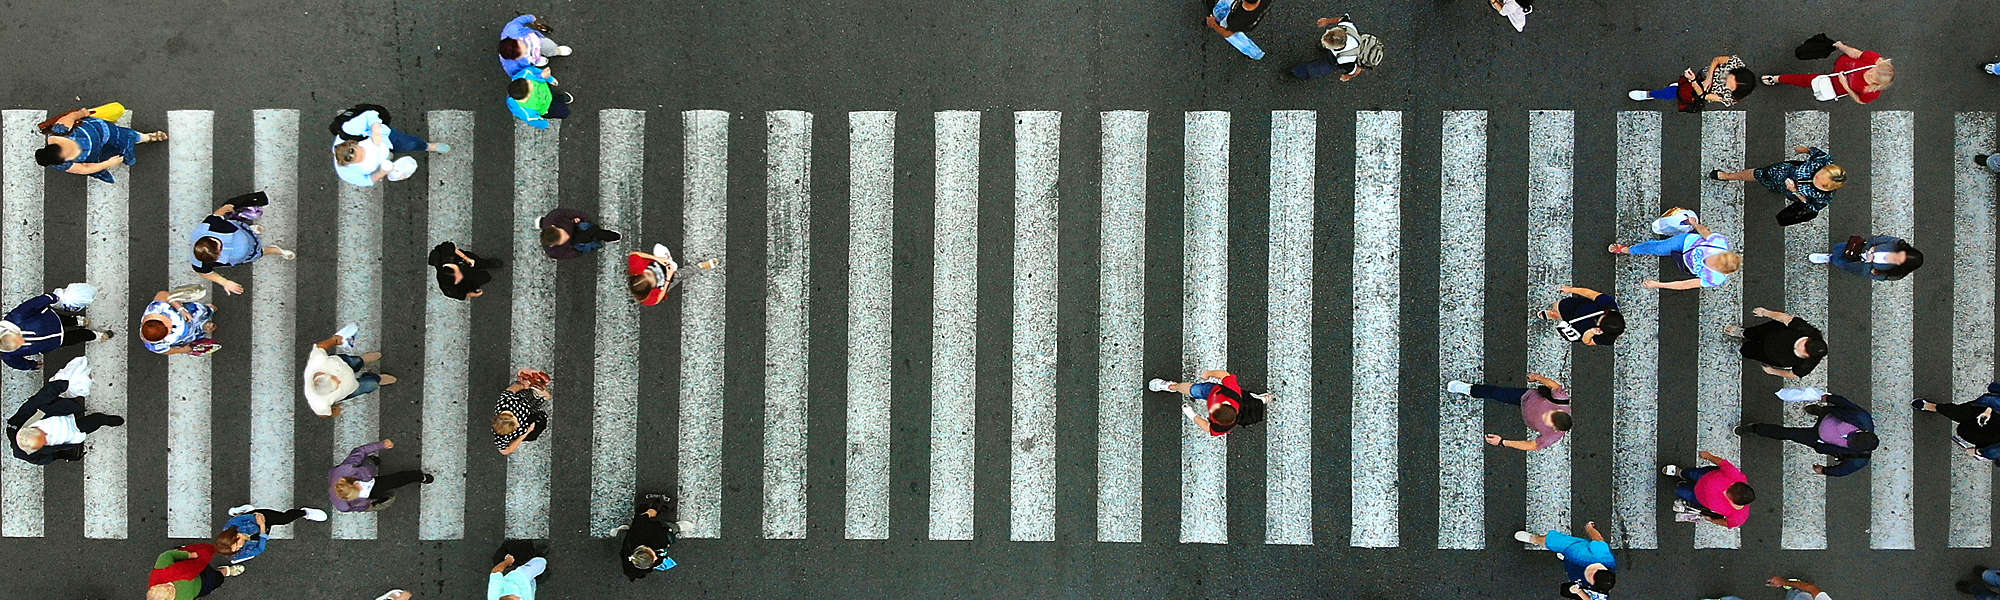 Aerial pedestrian crossing